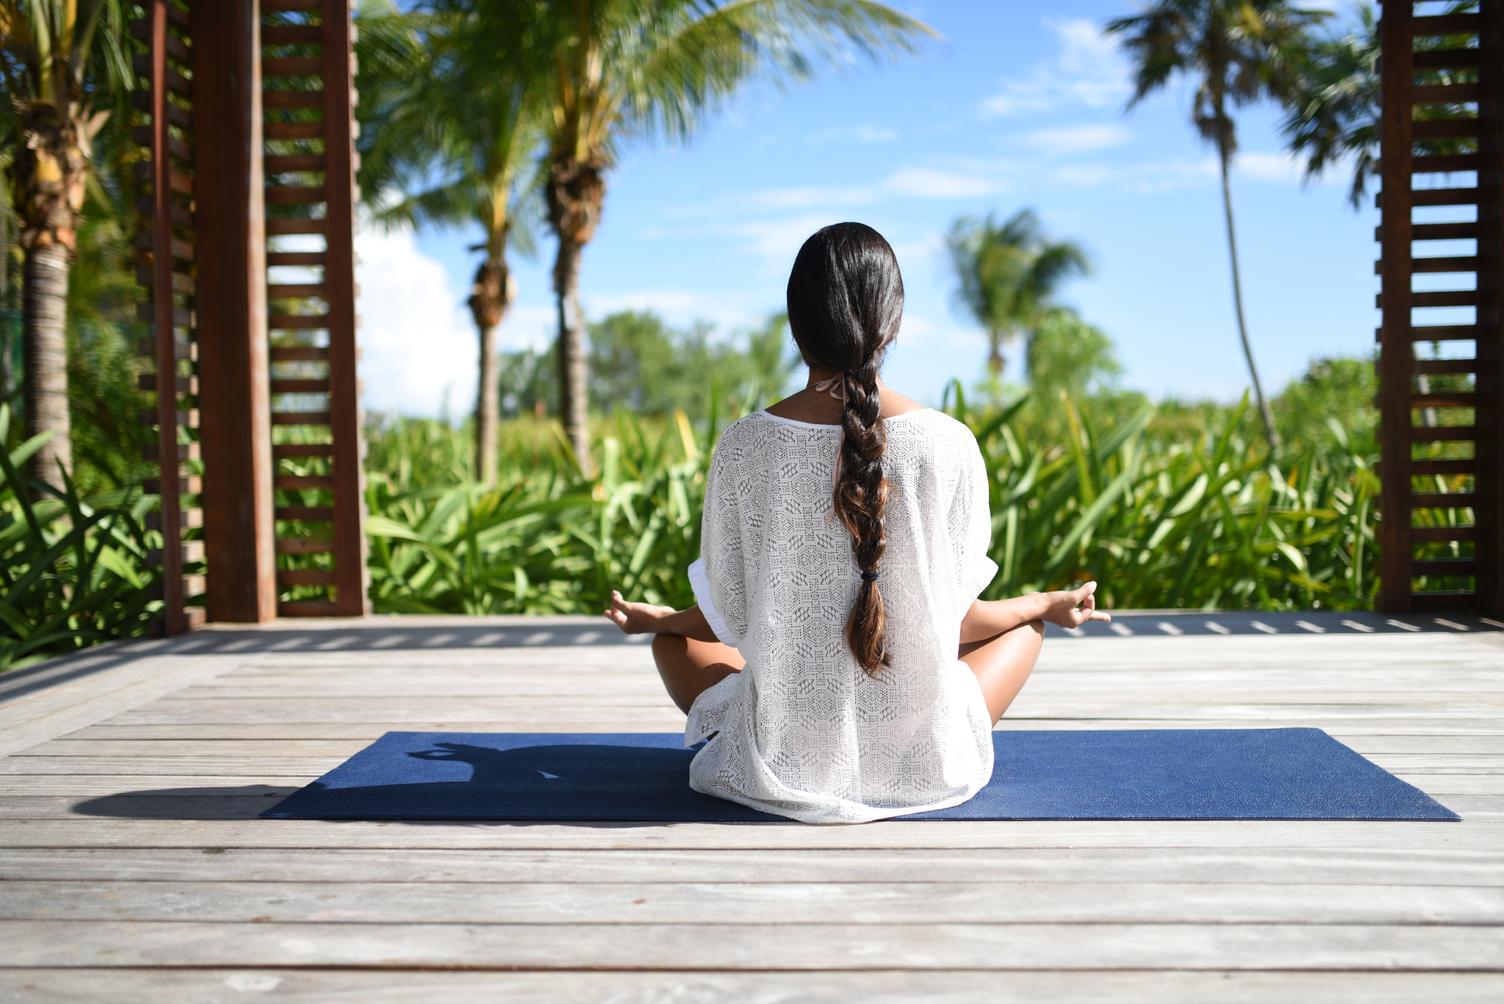 UNICO_yoga_meditation.jpg